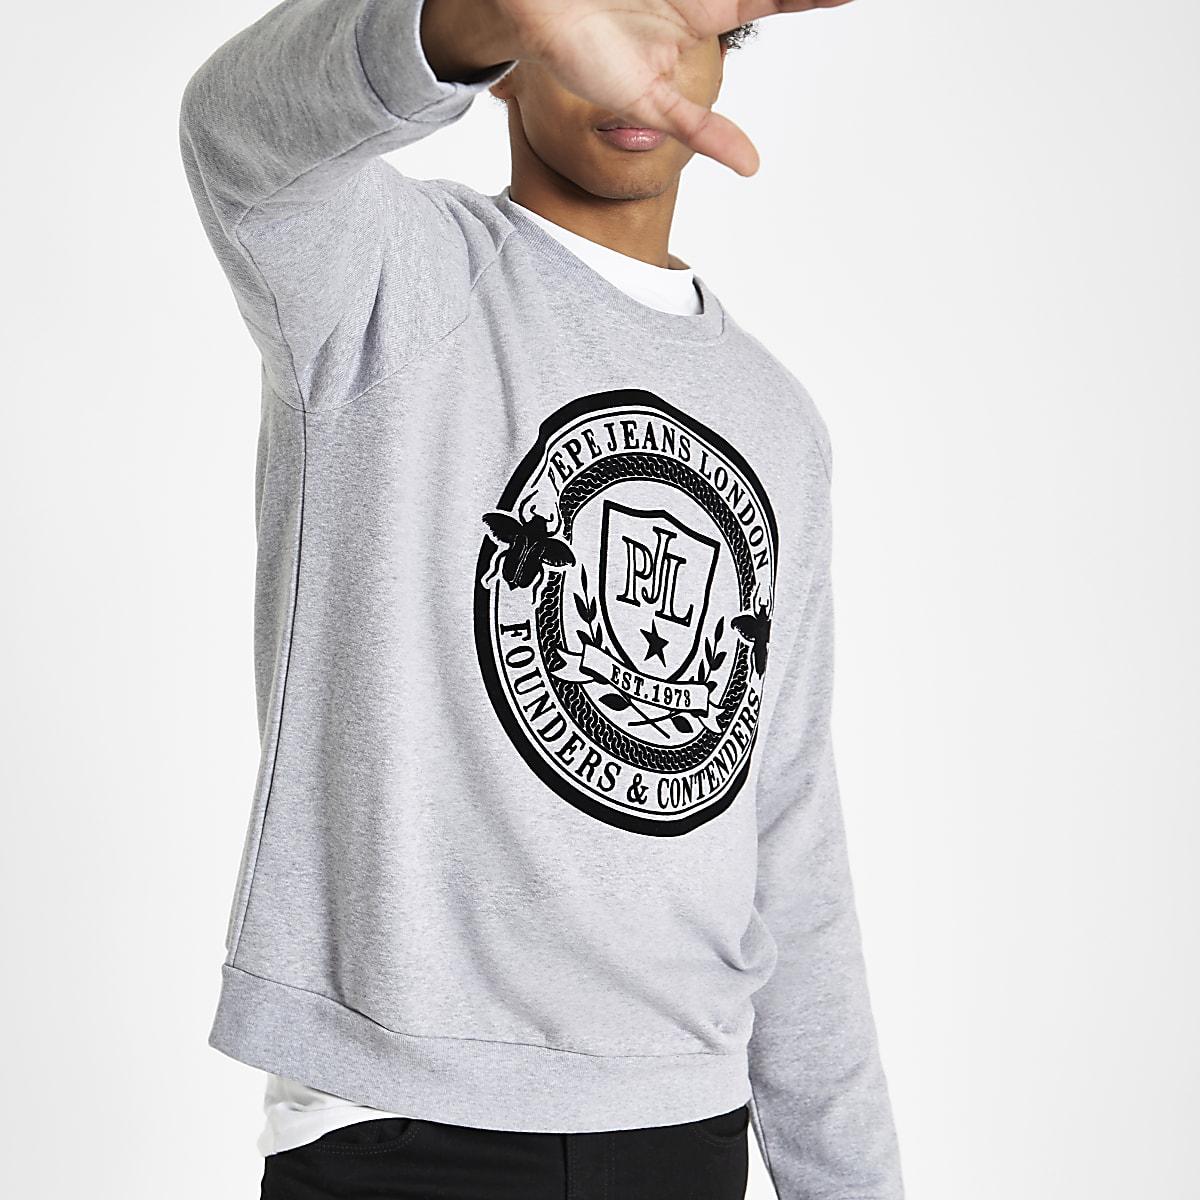 Pepe Jeans grey crest print sweatshirt